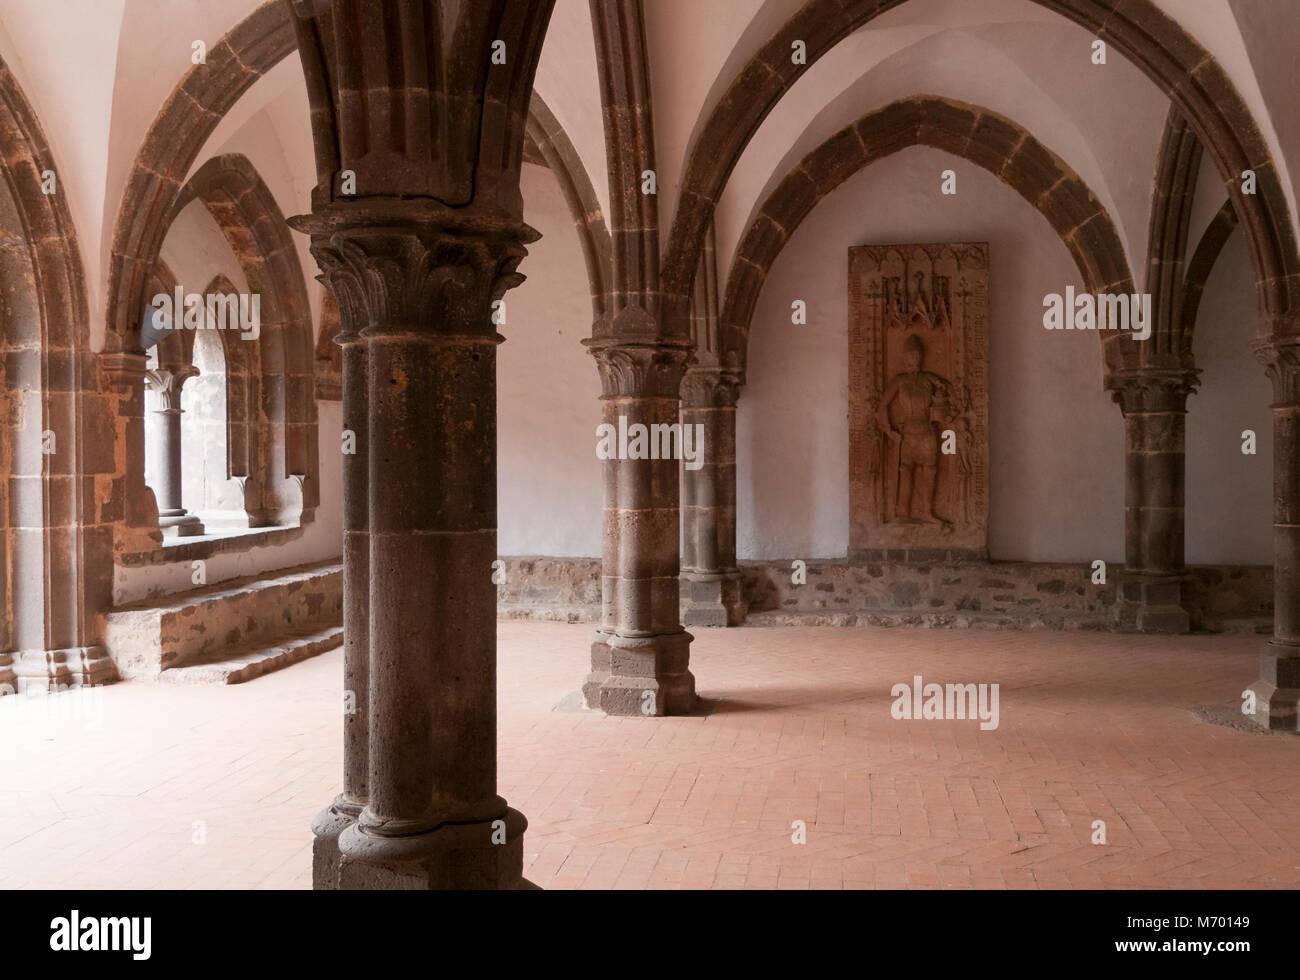 Kloster Arnsburg, Hessen, Deutschland, Europa Stockbild